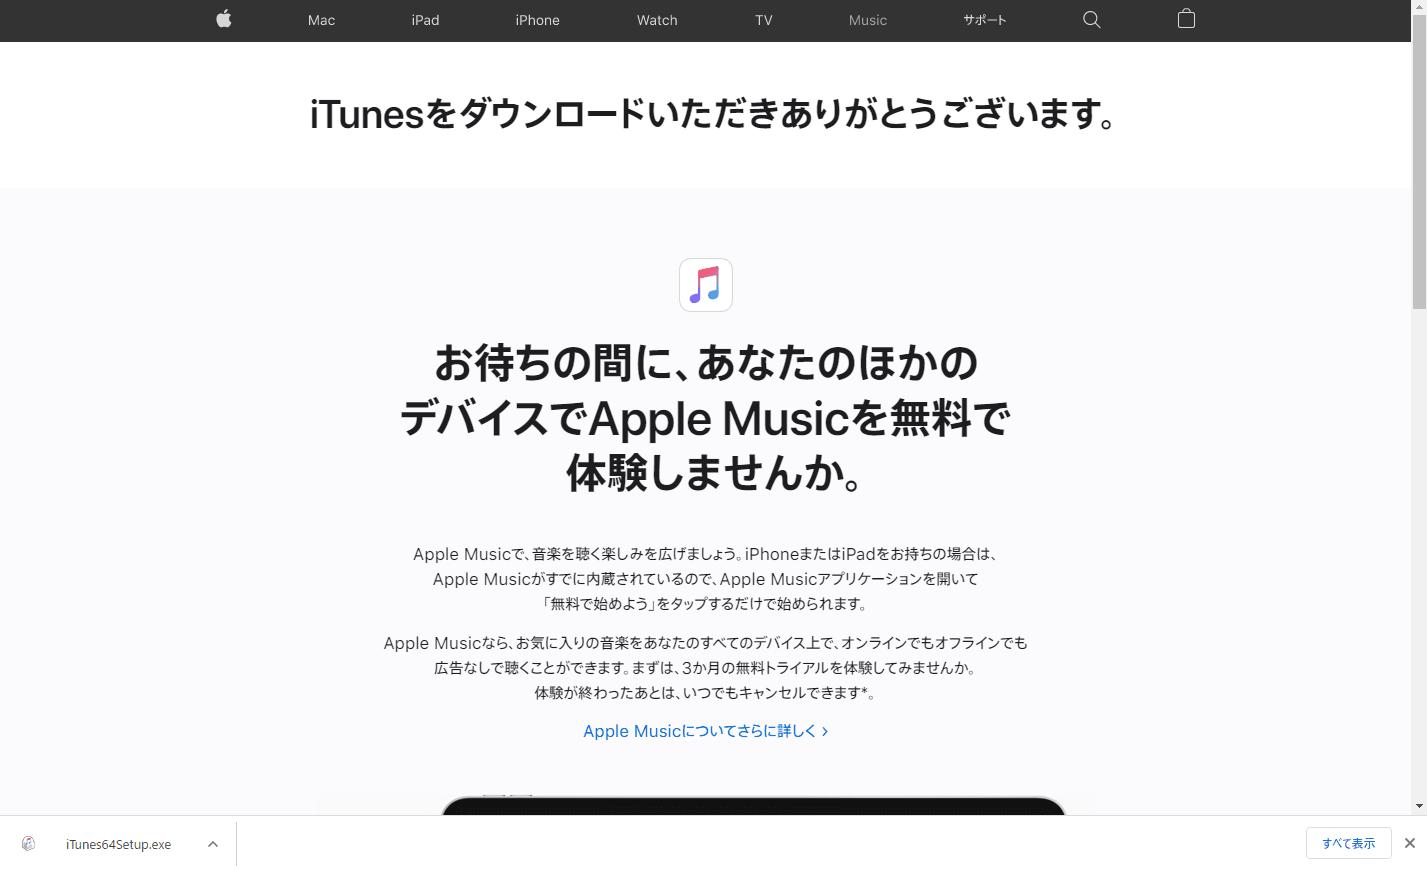 iTunesインストール